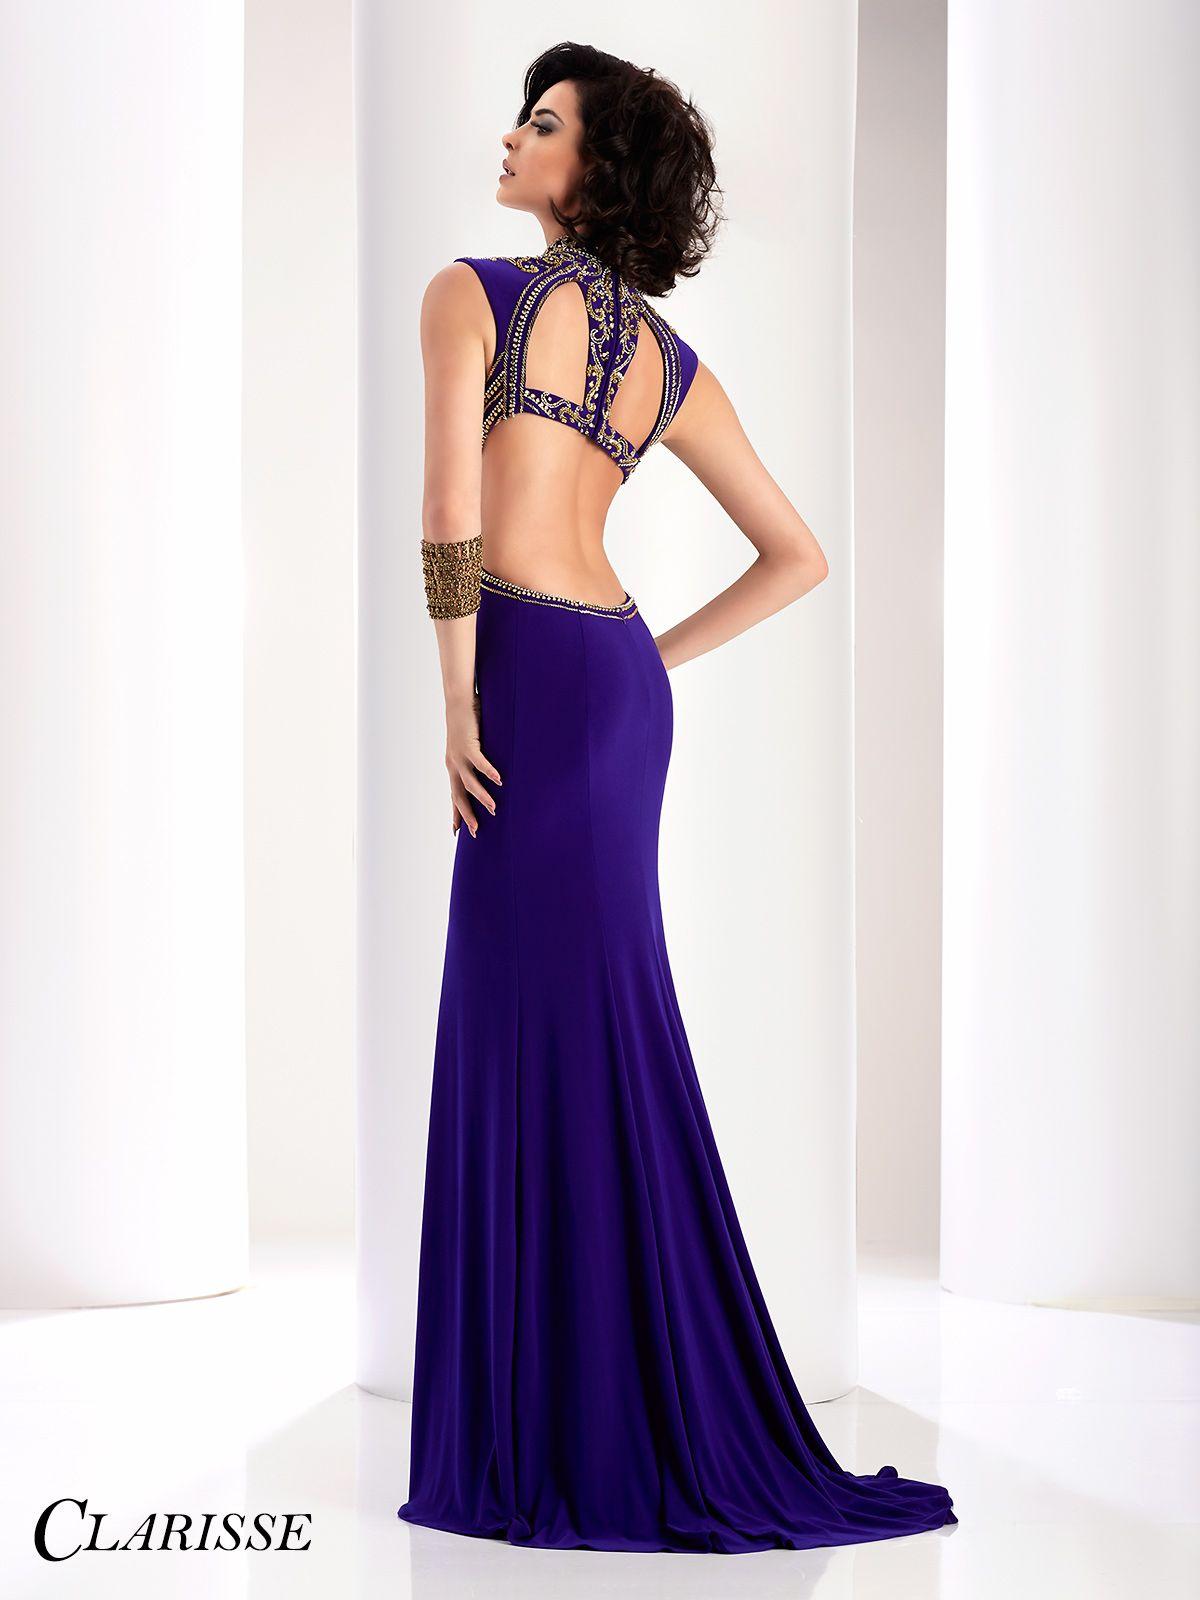 Clarisse Purple and Gold Cutout Prom Dress 4834 | Pinterest ...